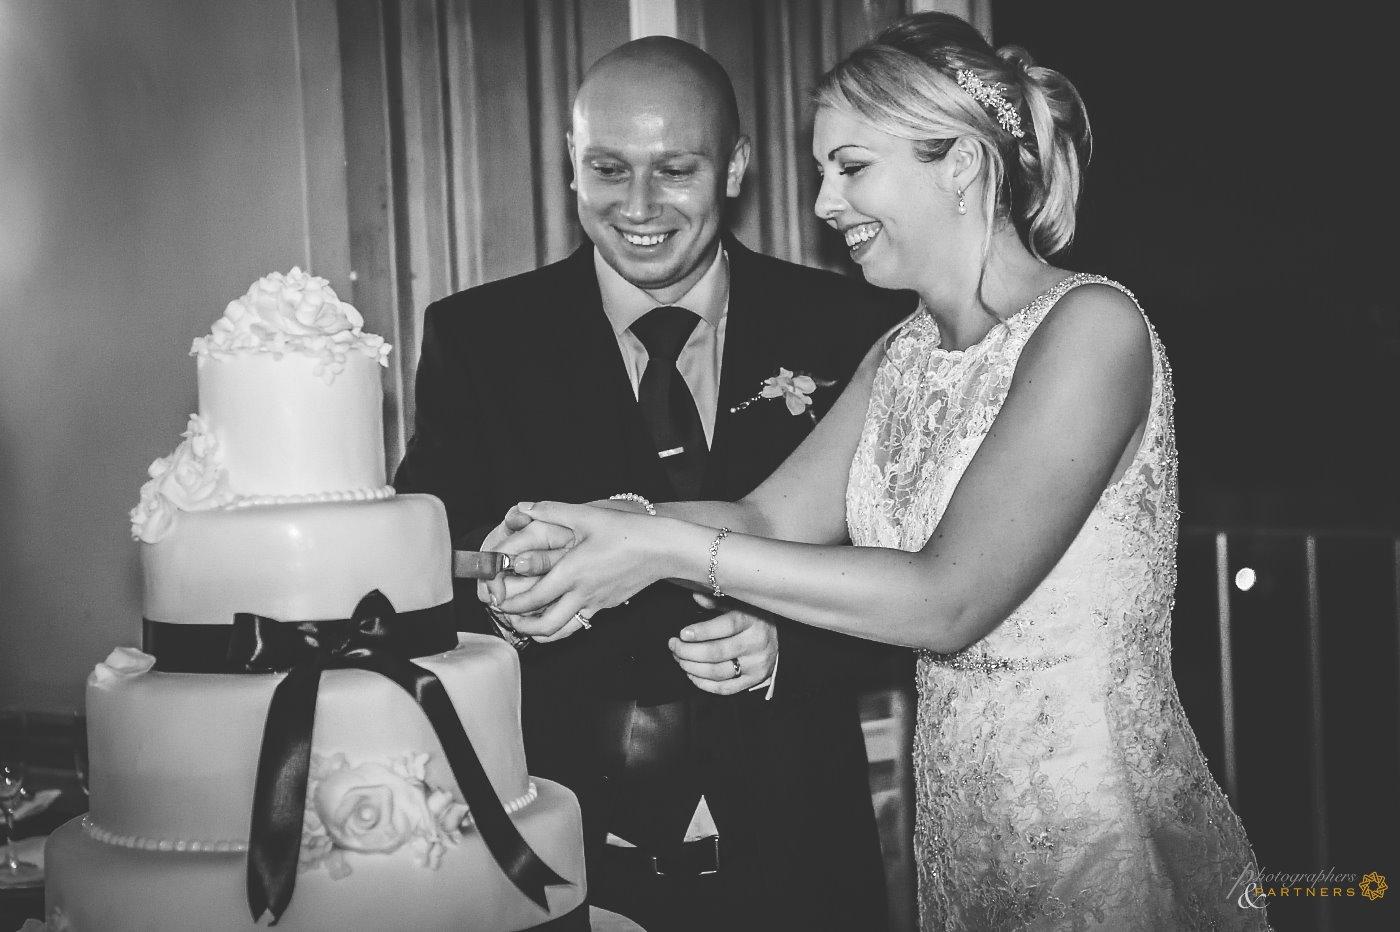 photography_weddings_villa_grazioli_21.jpg